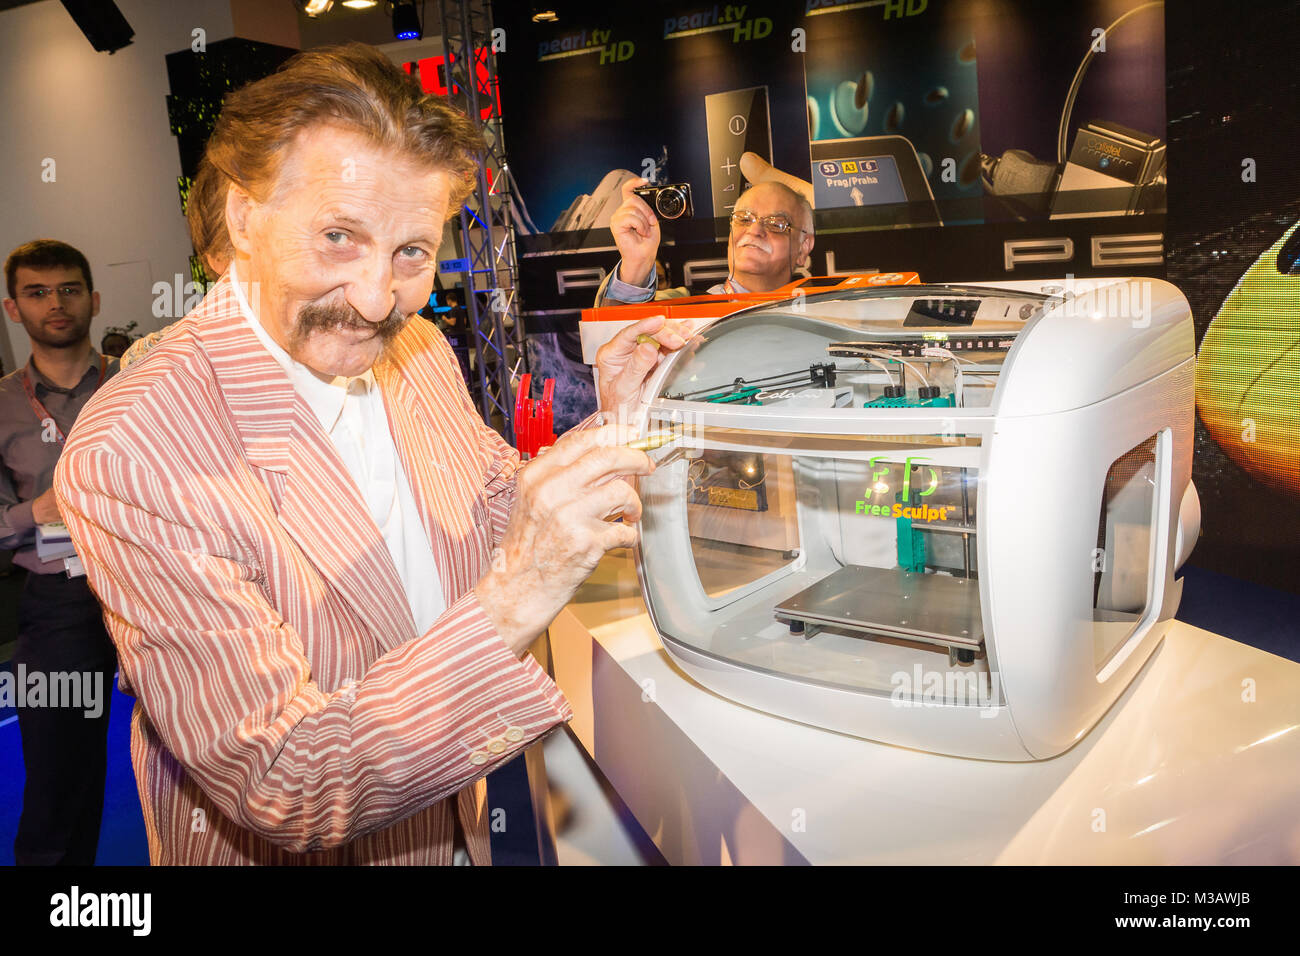 El profesor Luigi Colani ( deutscher Industriedesigner) beim Internetversandhandel stellt die neusten Perla 3D gratis Imagen De Stock